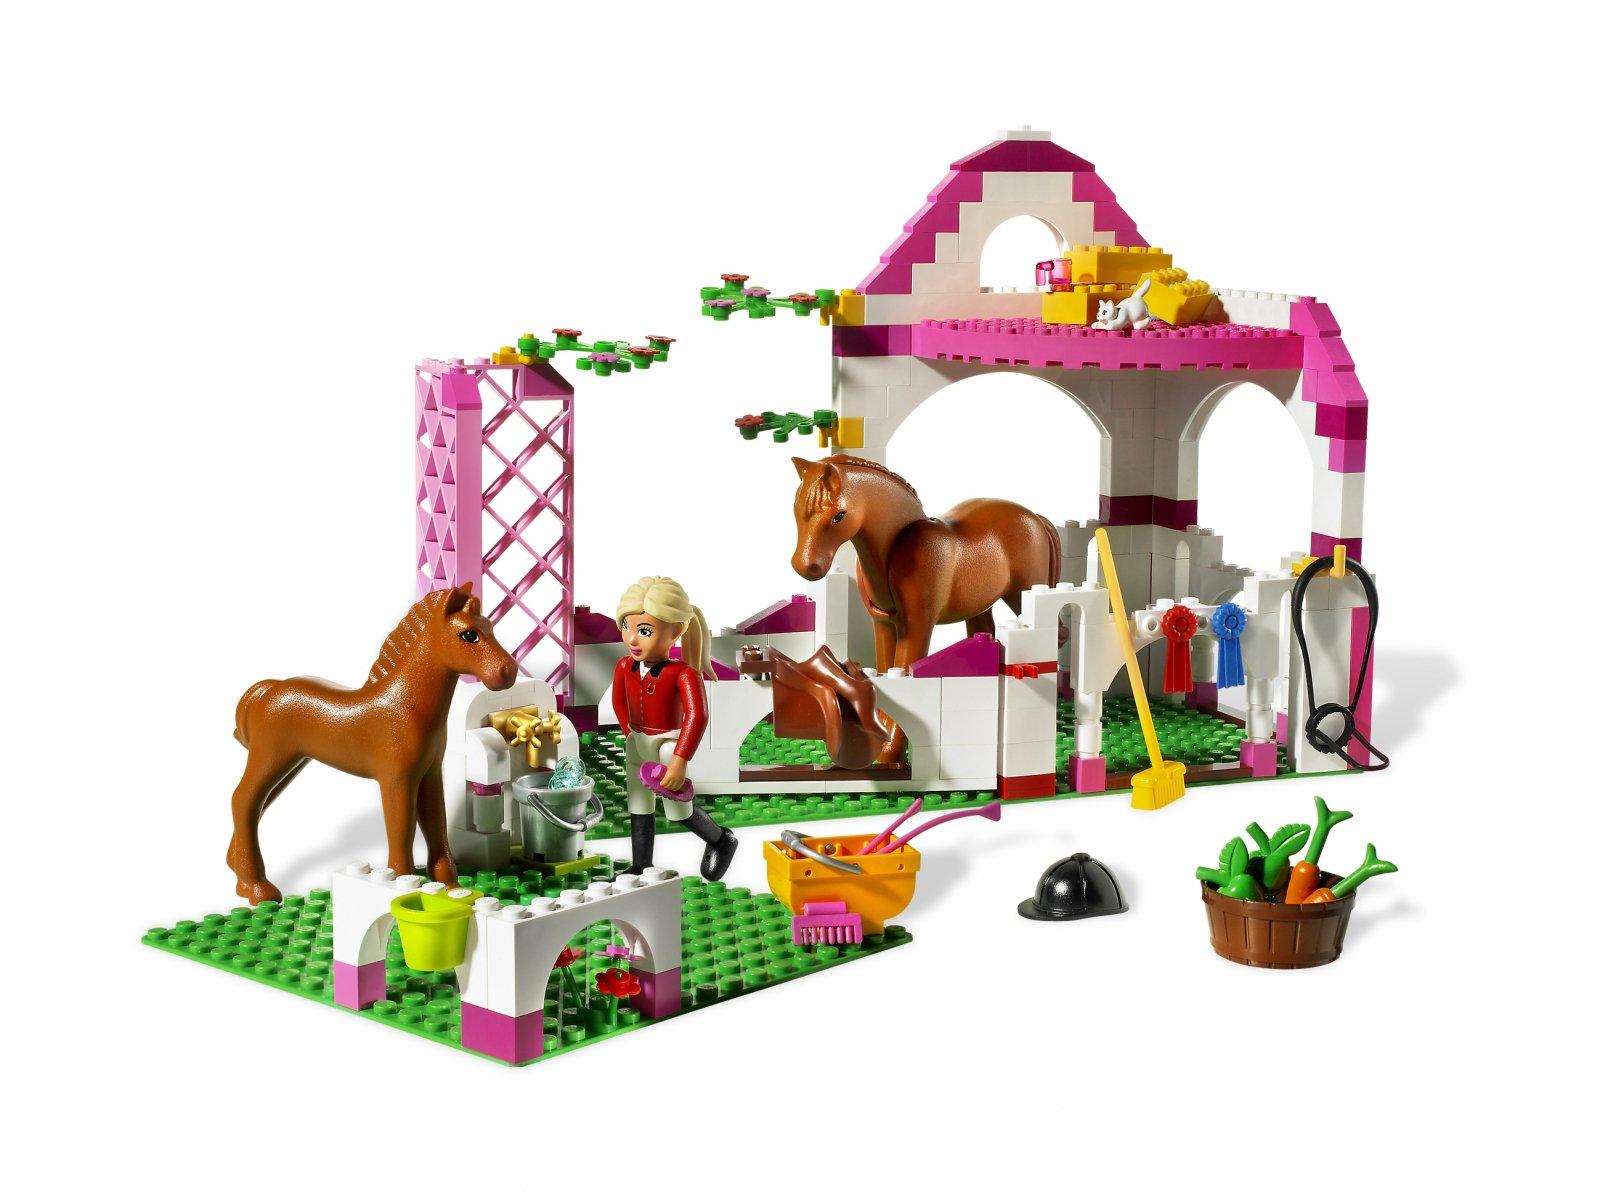 LEGO 7585 Belville Stajnia